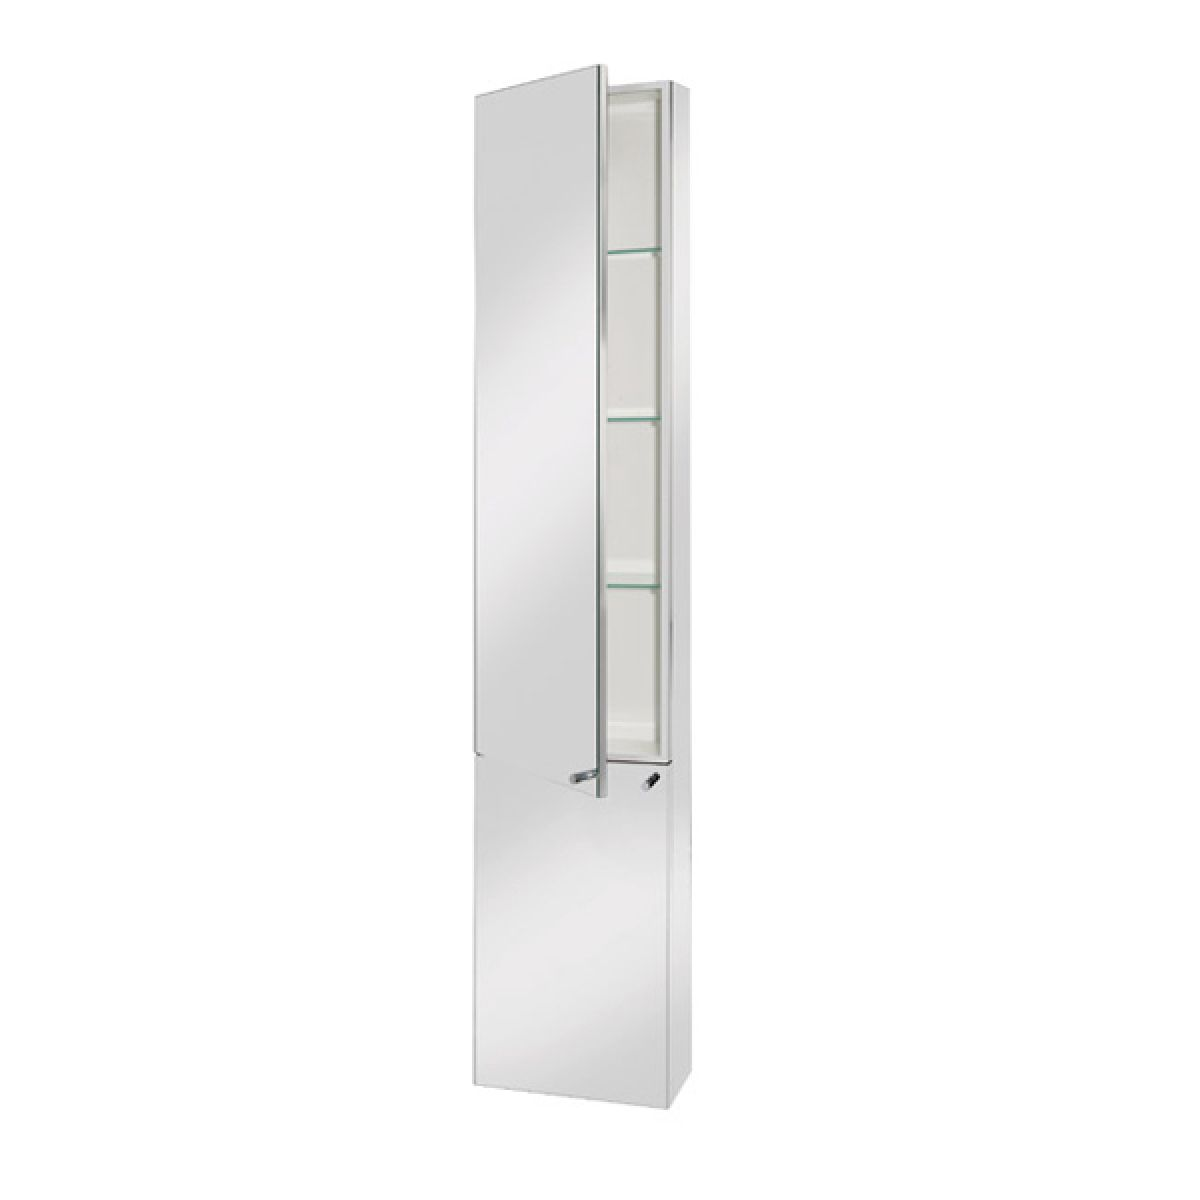 Croydex Nile Tall Stainless Steel Bathroom Cabinet